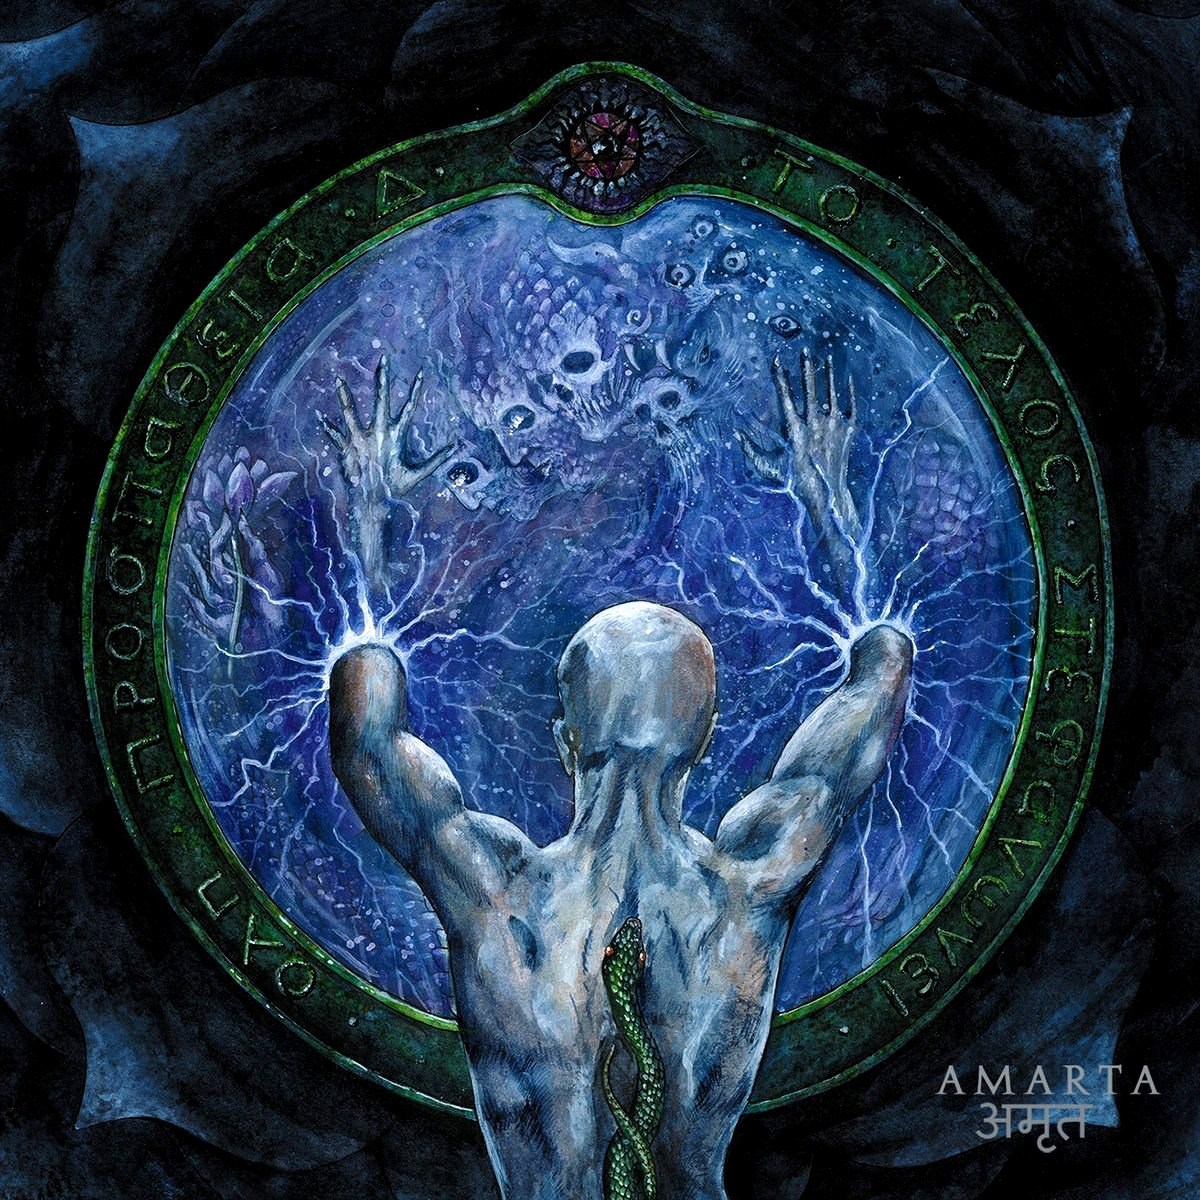 Reviews for Acherontas - Amarta अमर्त (Formulas of Reptilian Unification - Part II)